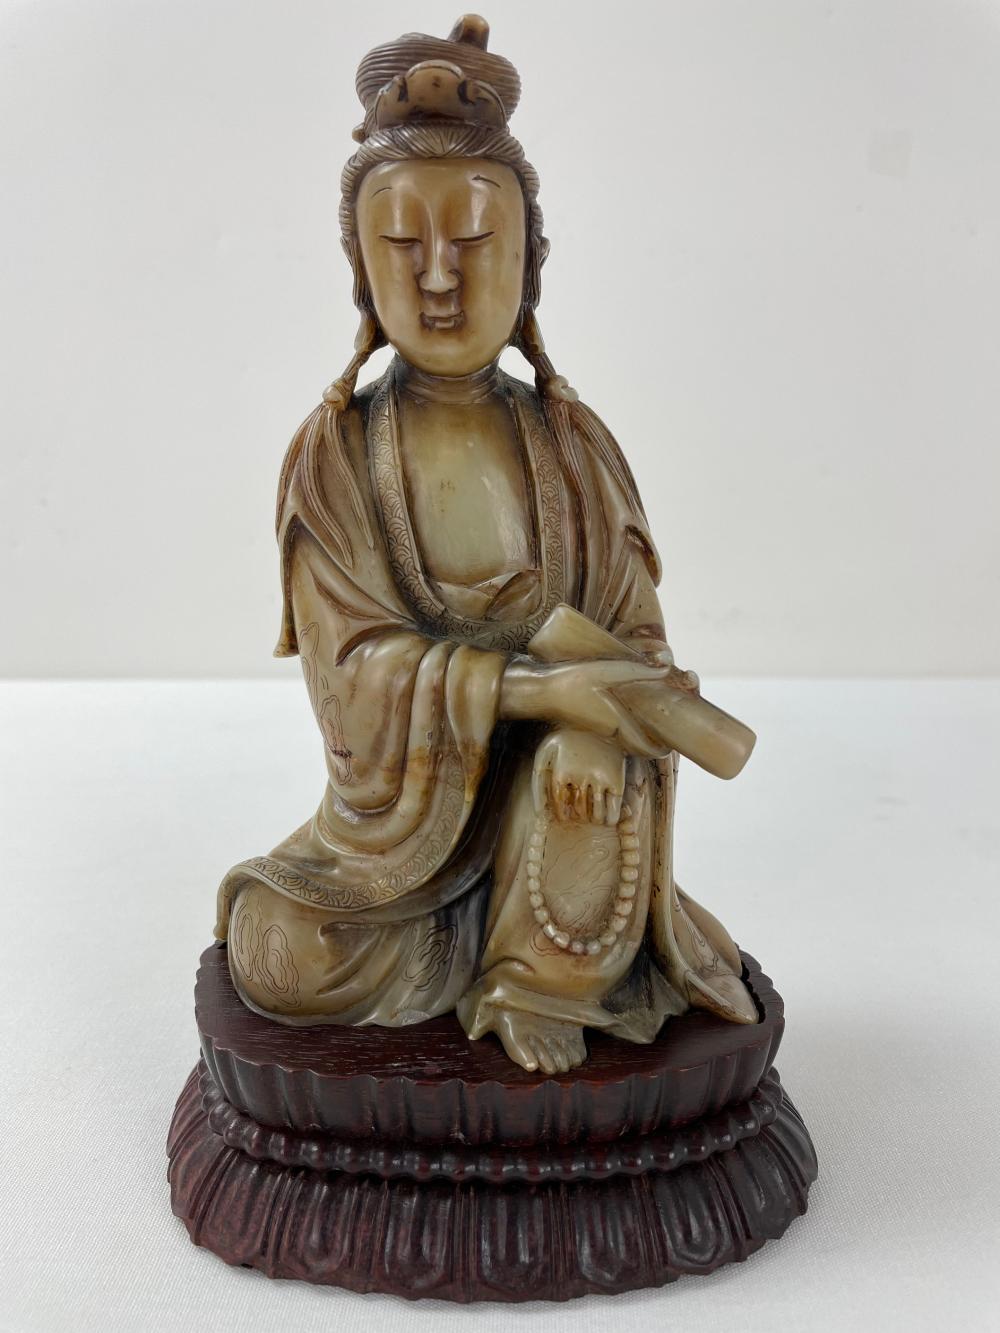 Chinese Carving Soapstone Figure of Guanyin Buddha